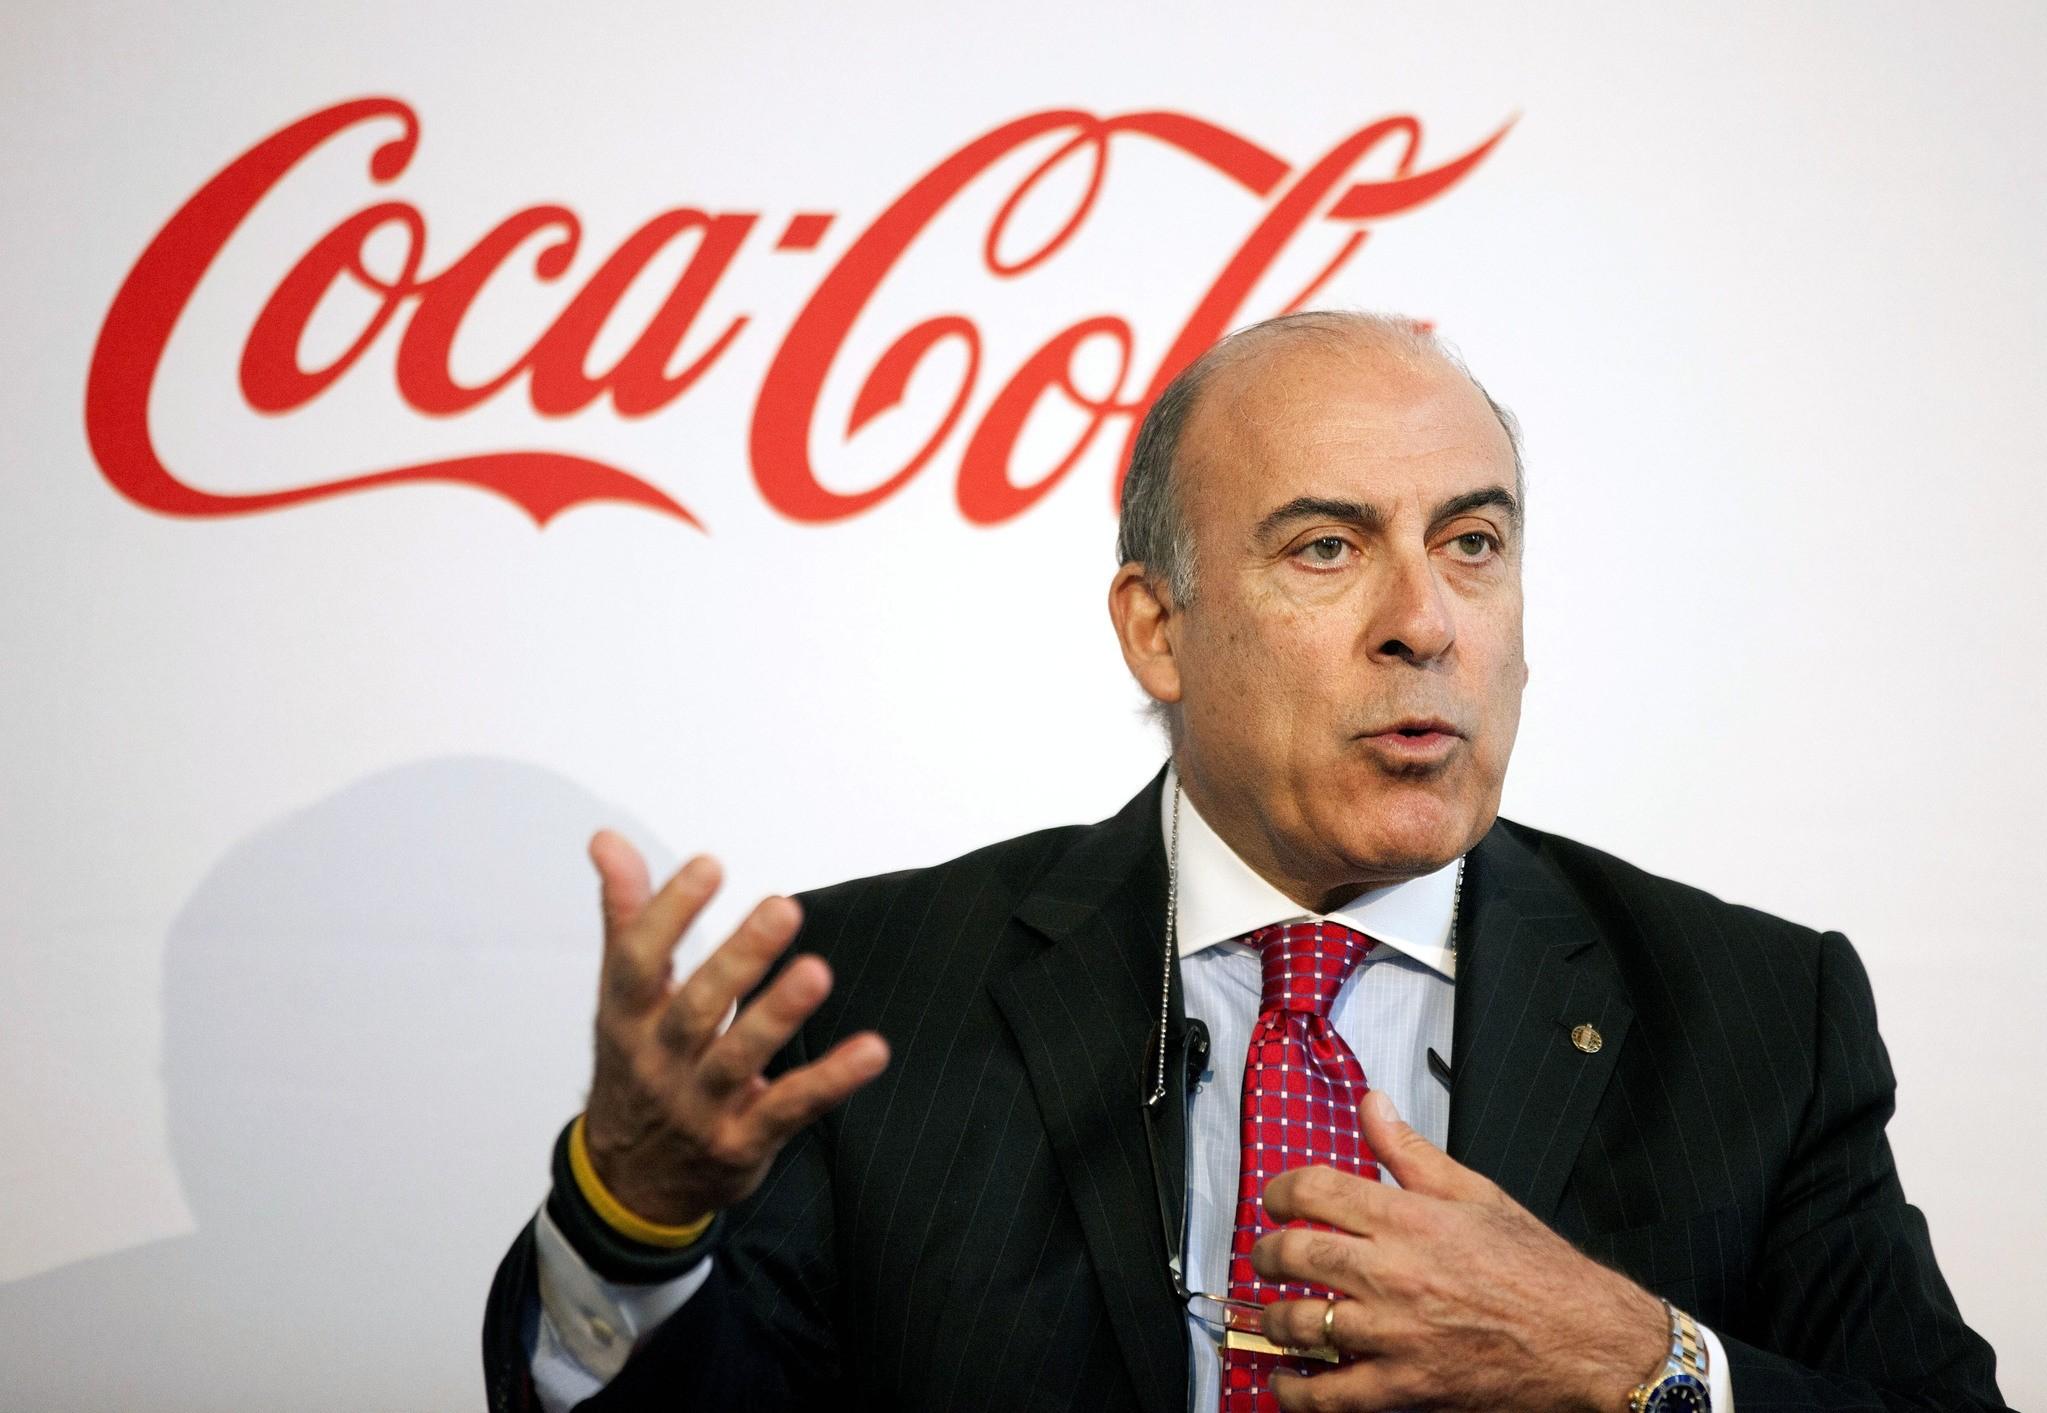 Coca-Cola CEO Muhtar Kent speaks during a news conference in Atlanta. Coca-Cola said Friday, Dec. 9, 2016 (AP Photo)